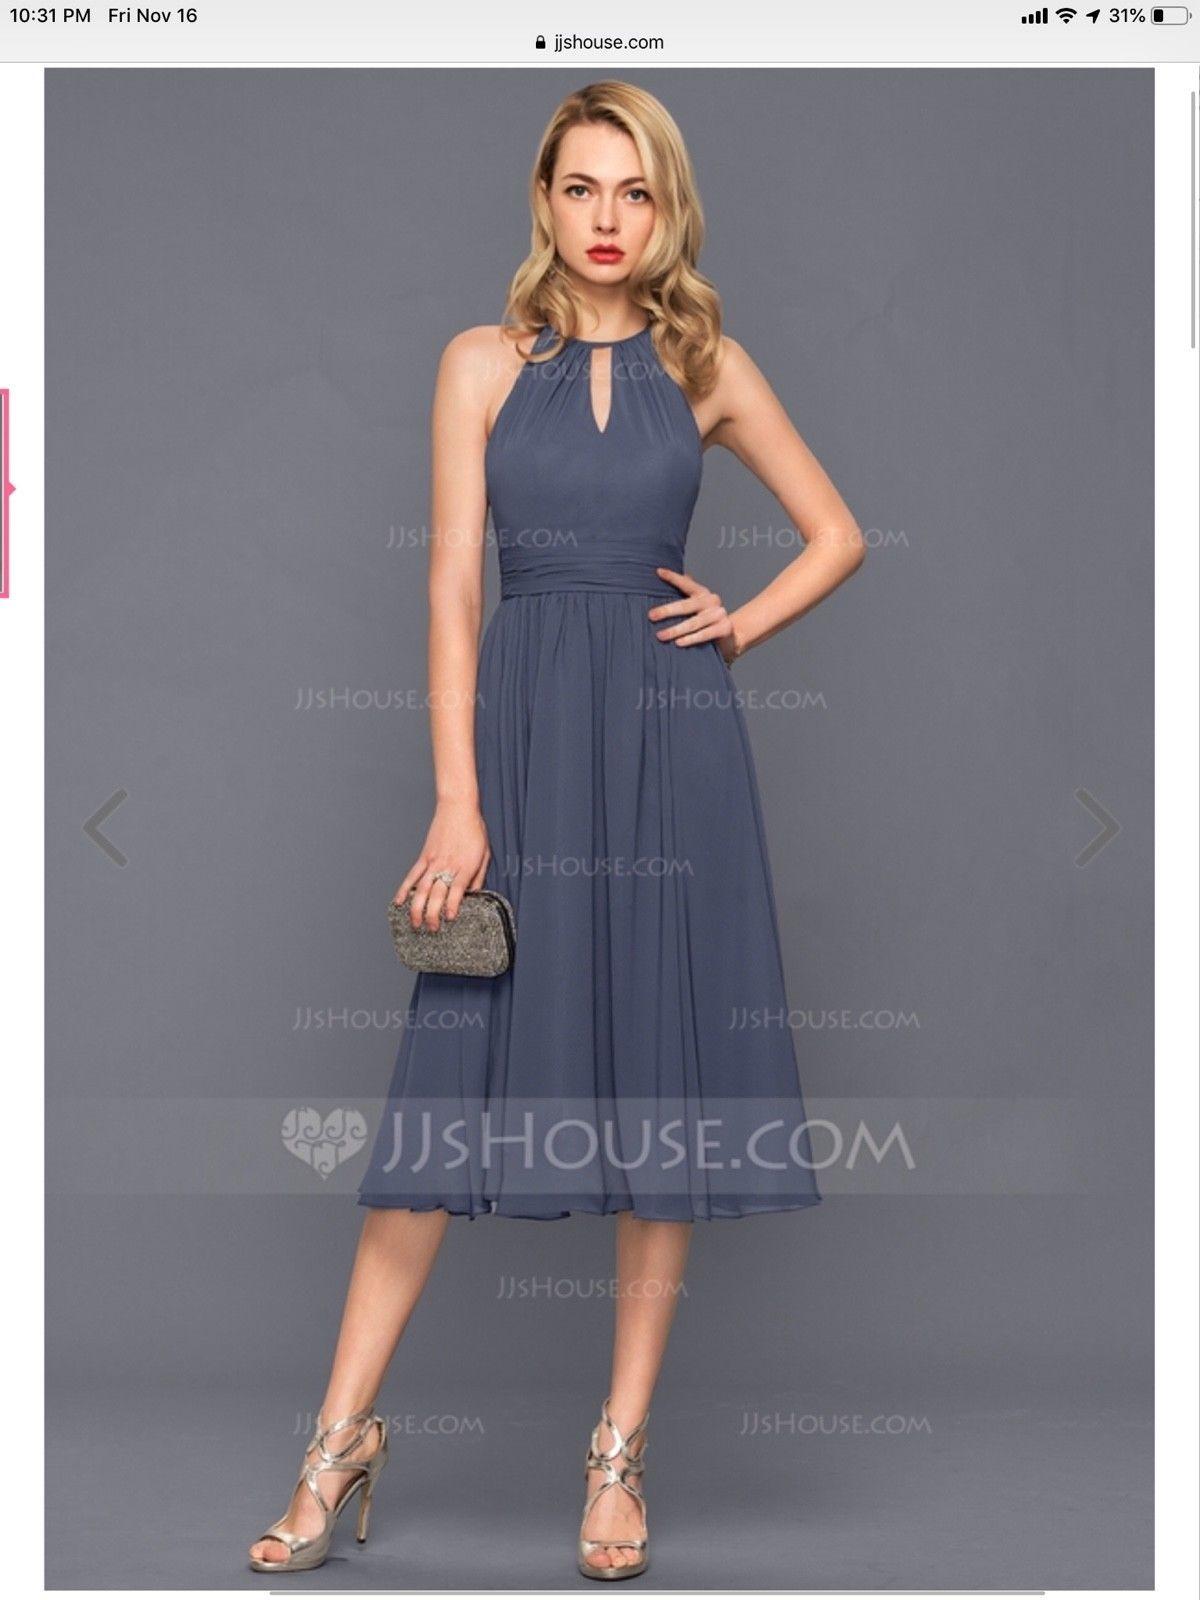 947d99b505d JJ s House  A-Line Princess Scoop Neck Knee-Length Chiffon Cocktail Dress  With R